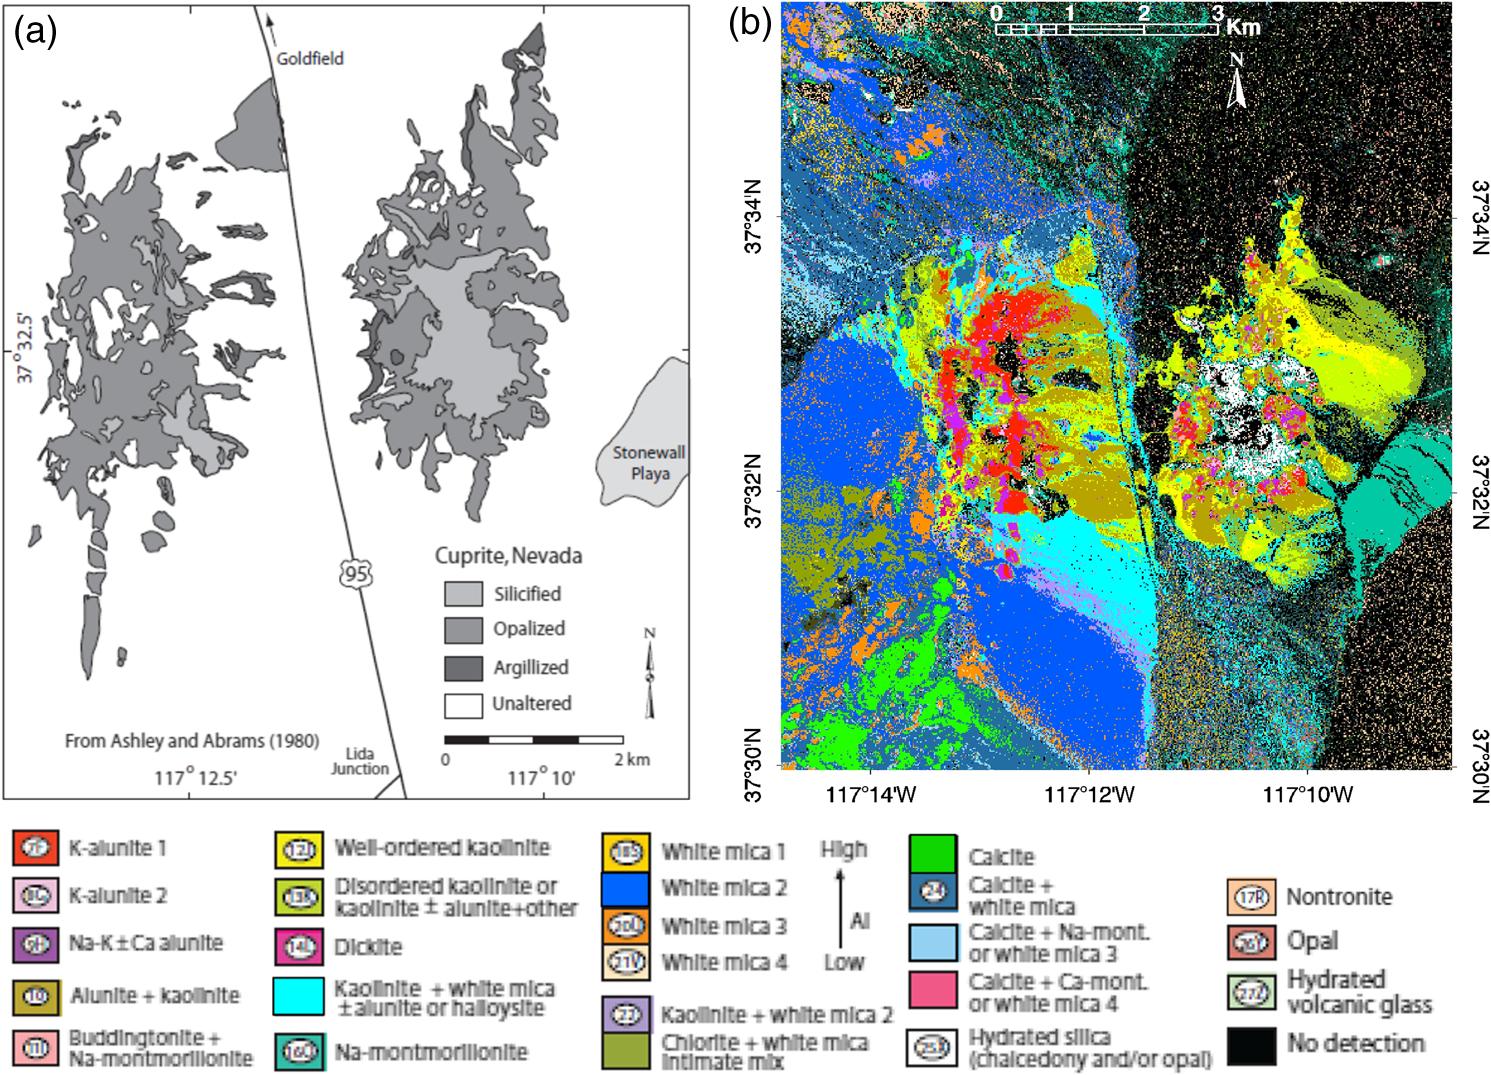 Validation of DigitalGlobe WorldView-3 Earth imaging